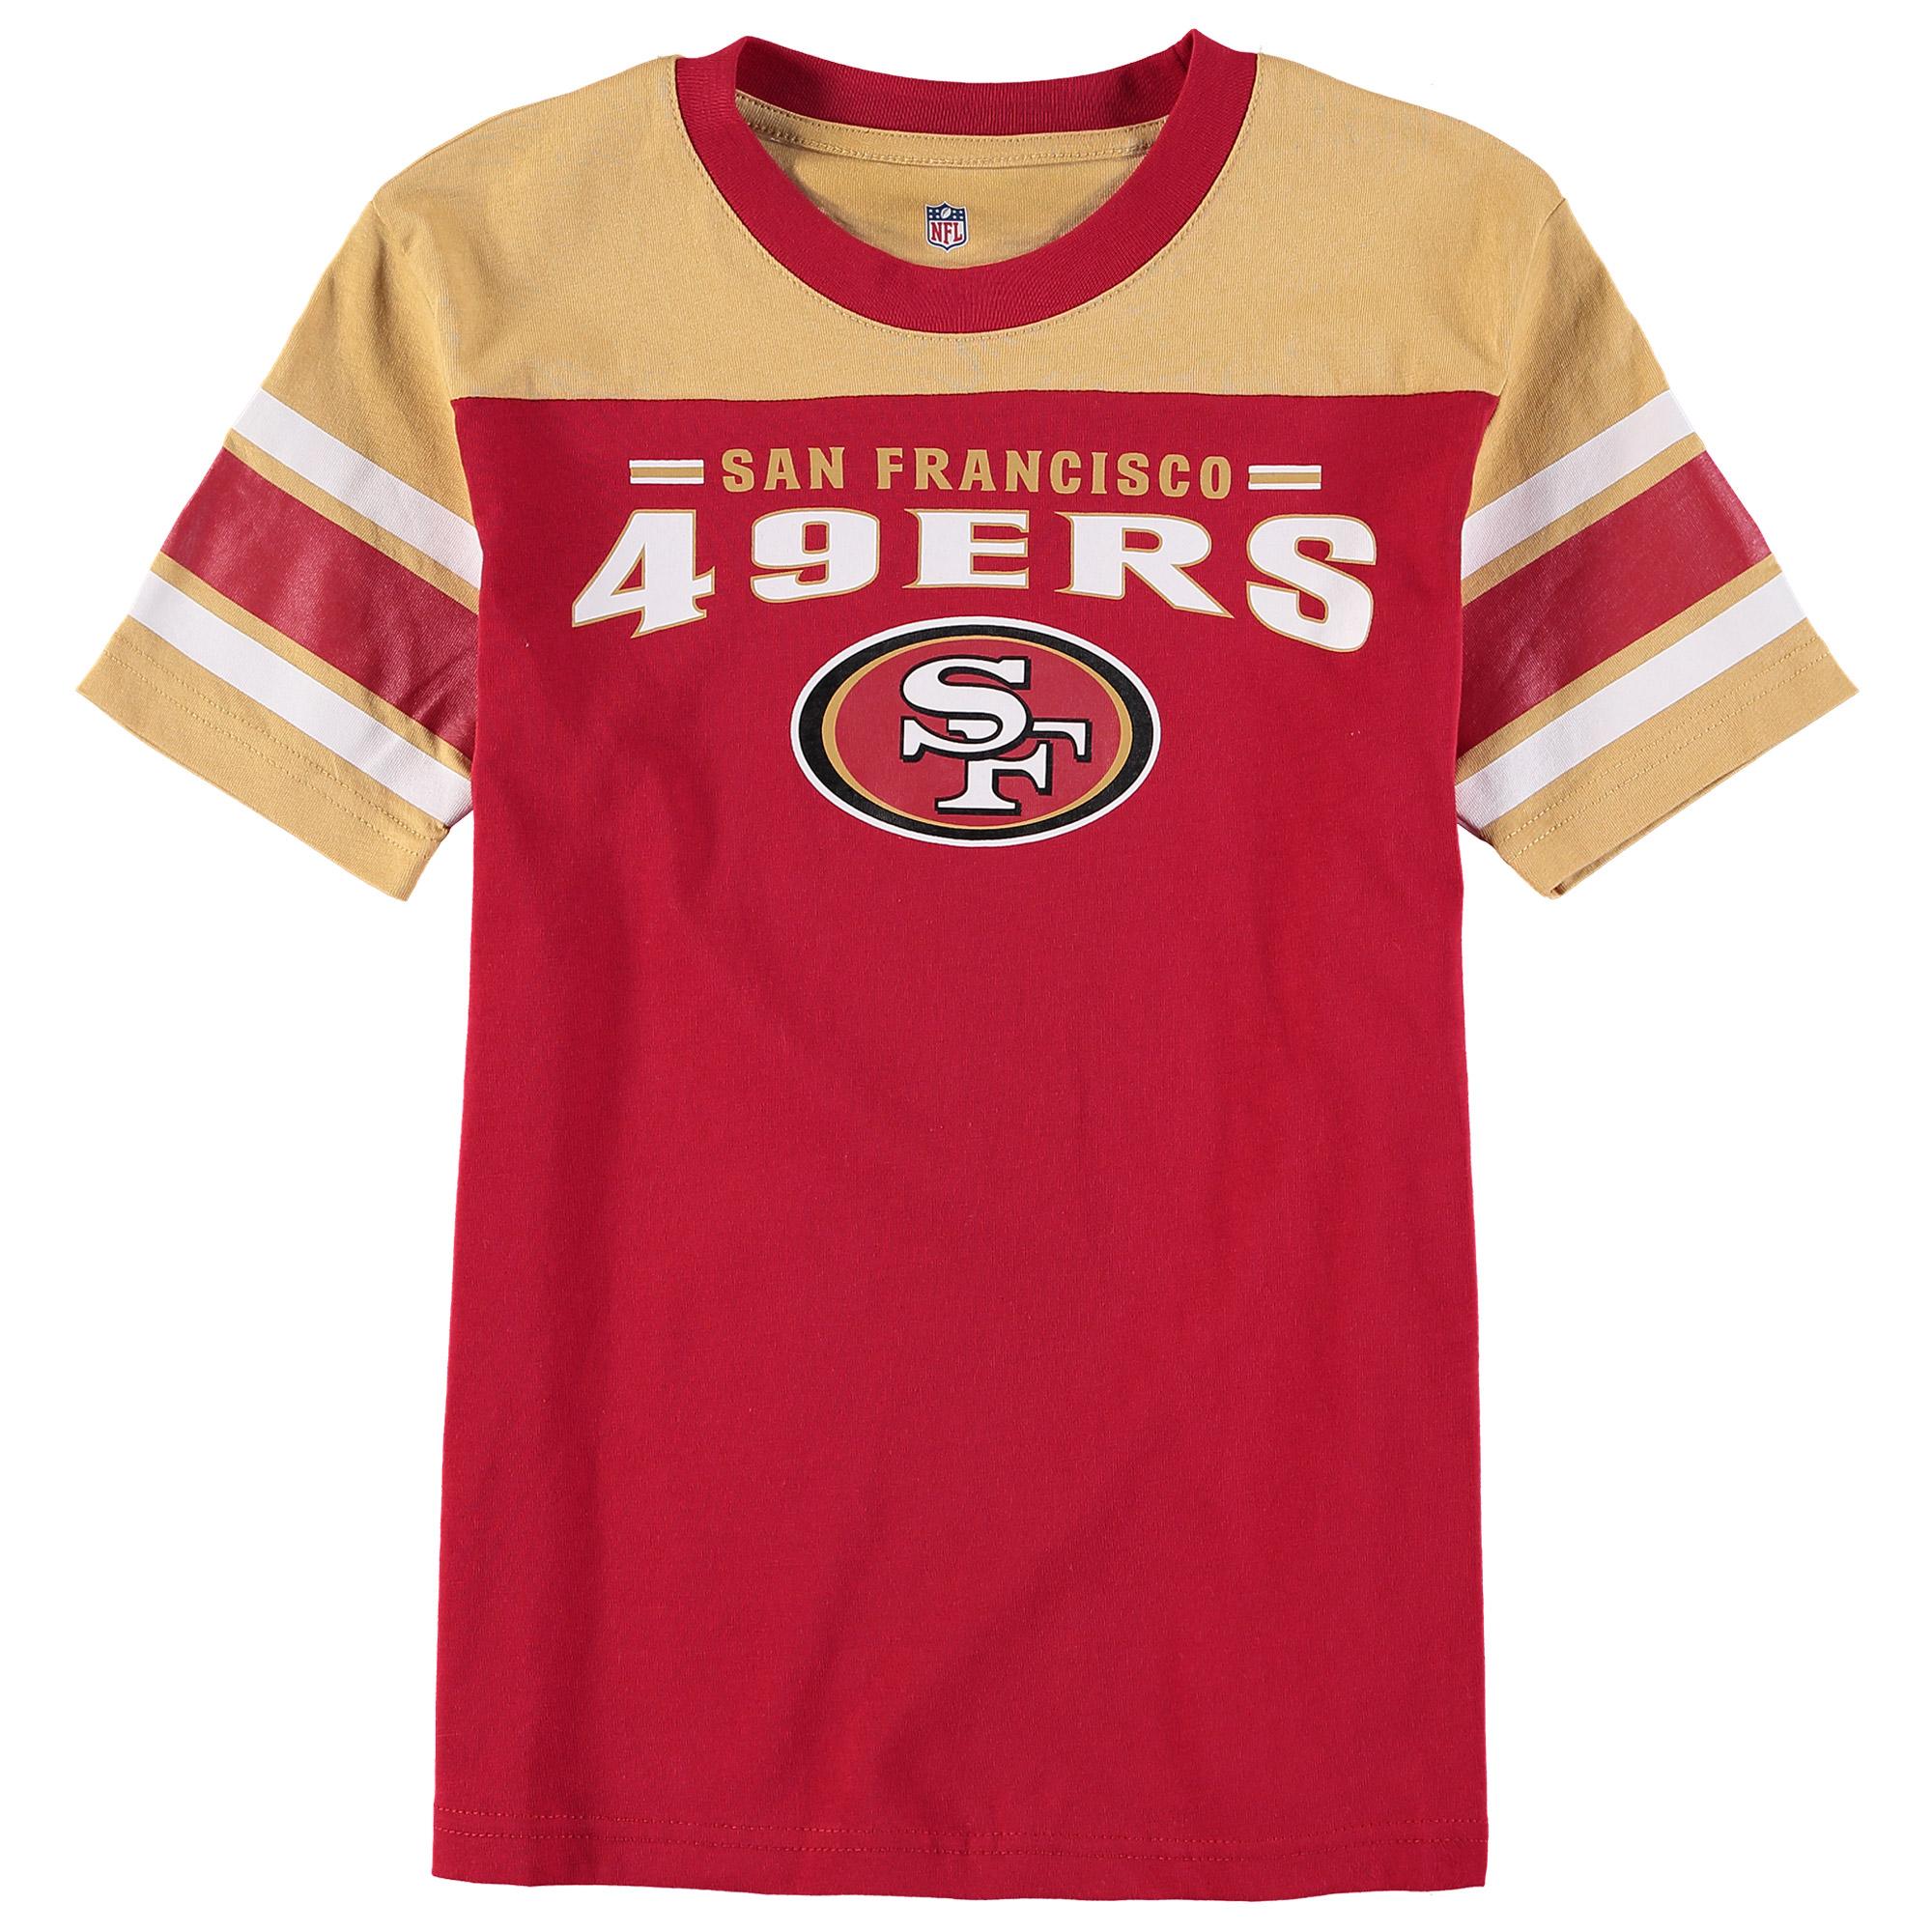 San Francisco 49ers Youth Fan Gear Loyalty T-Shirt - Gold/Scarlet